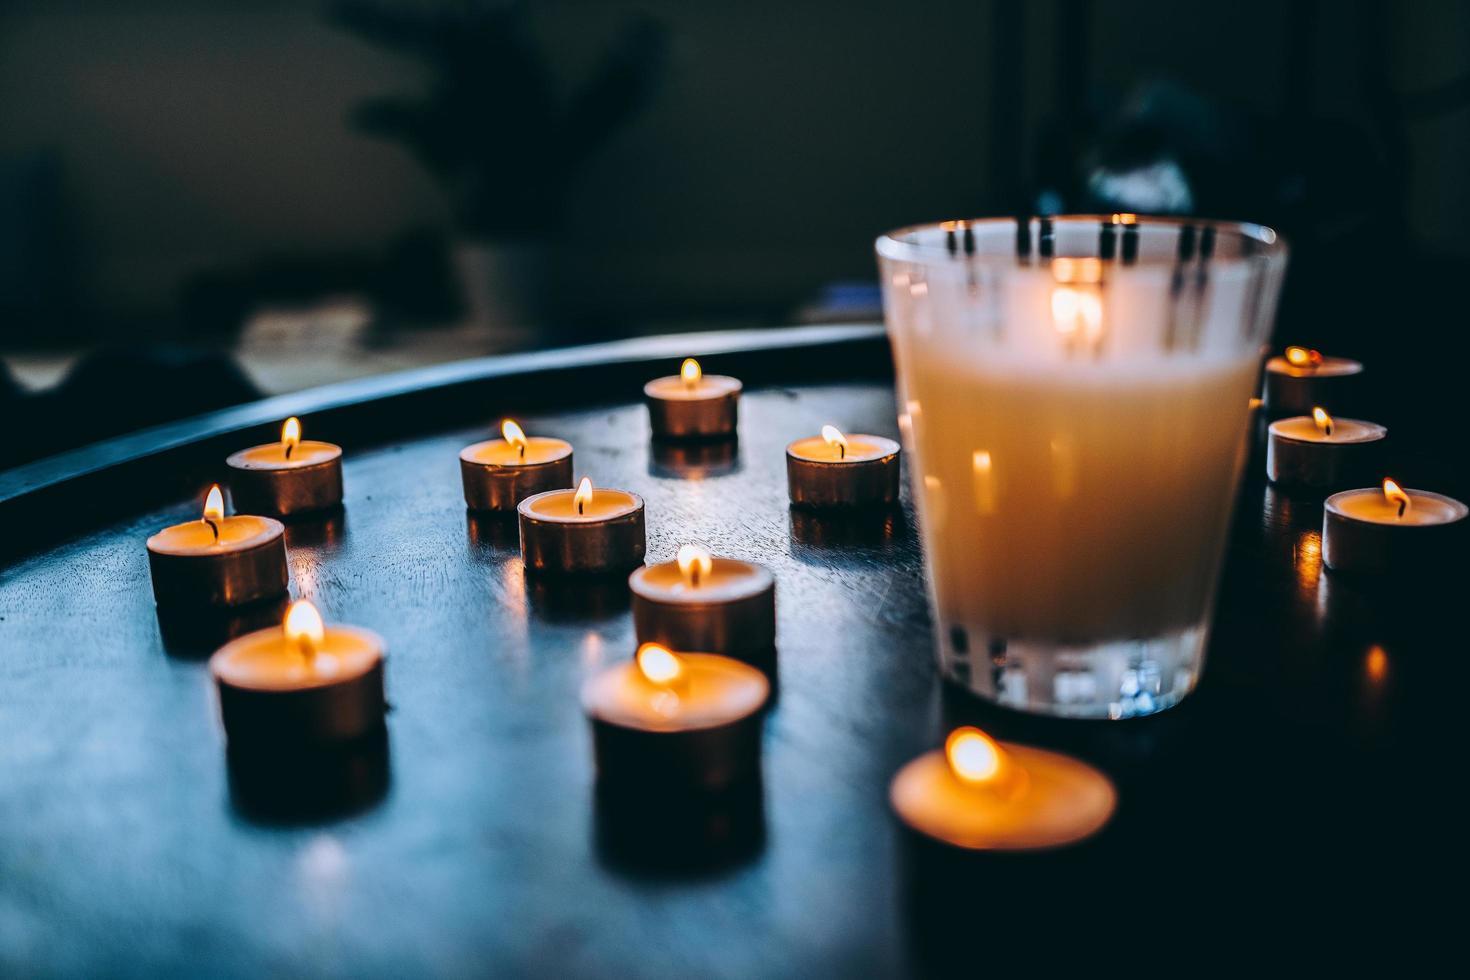 velas acesas na mesa foto